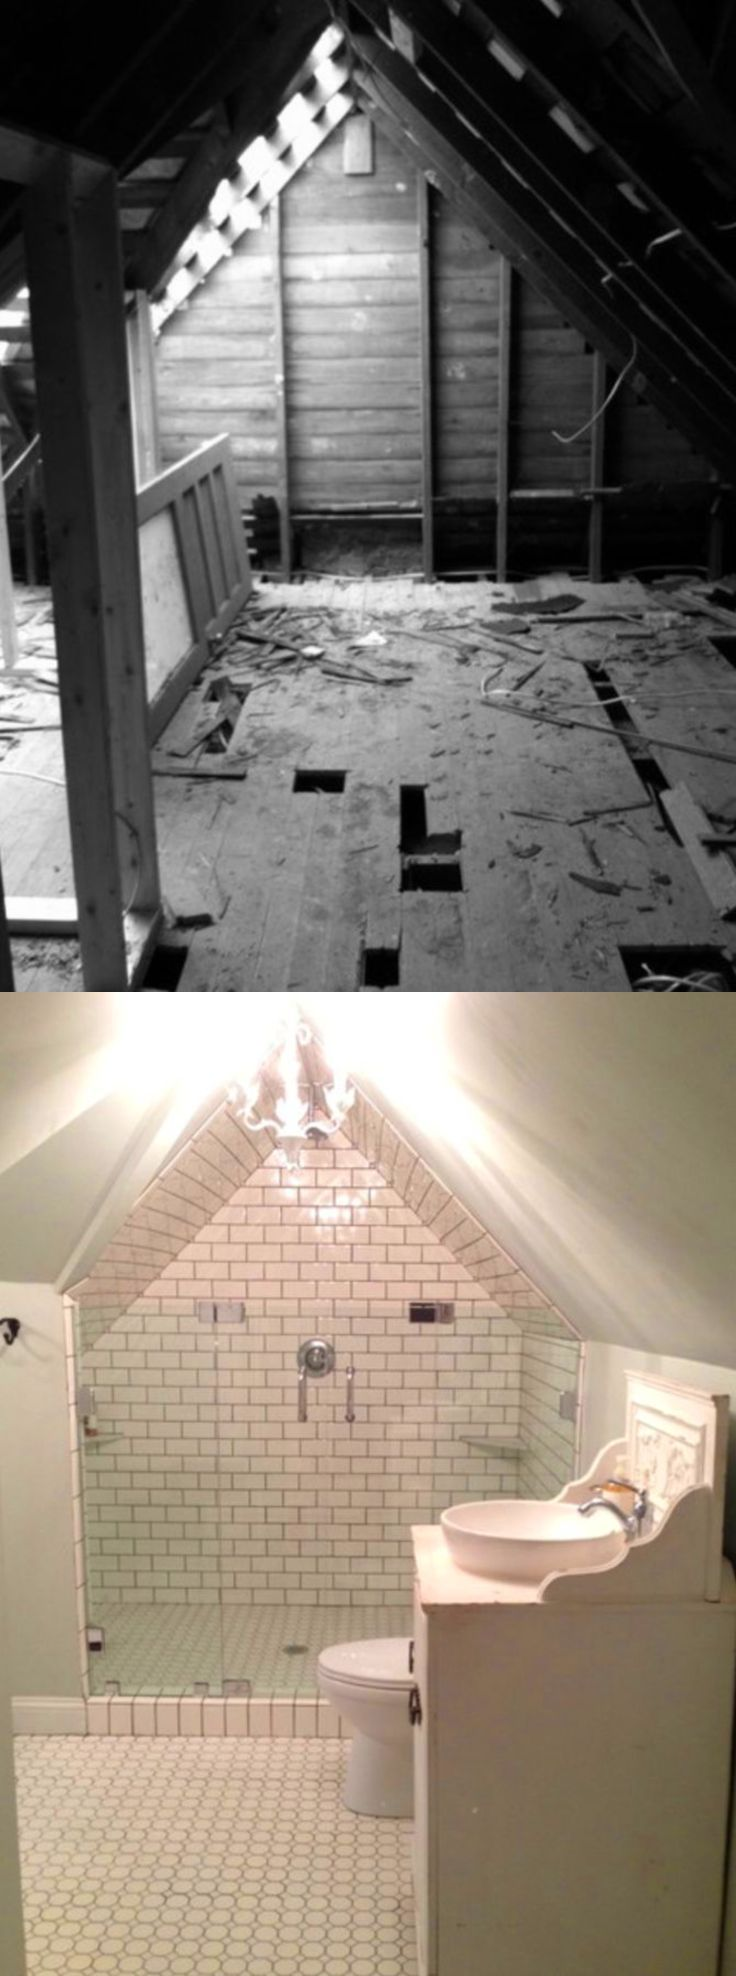 Before and After: Magnolia Homes' Farmhouse Attic Bathroom Reno